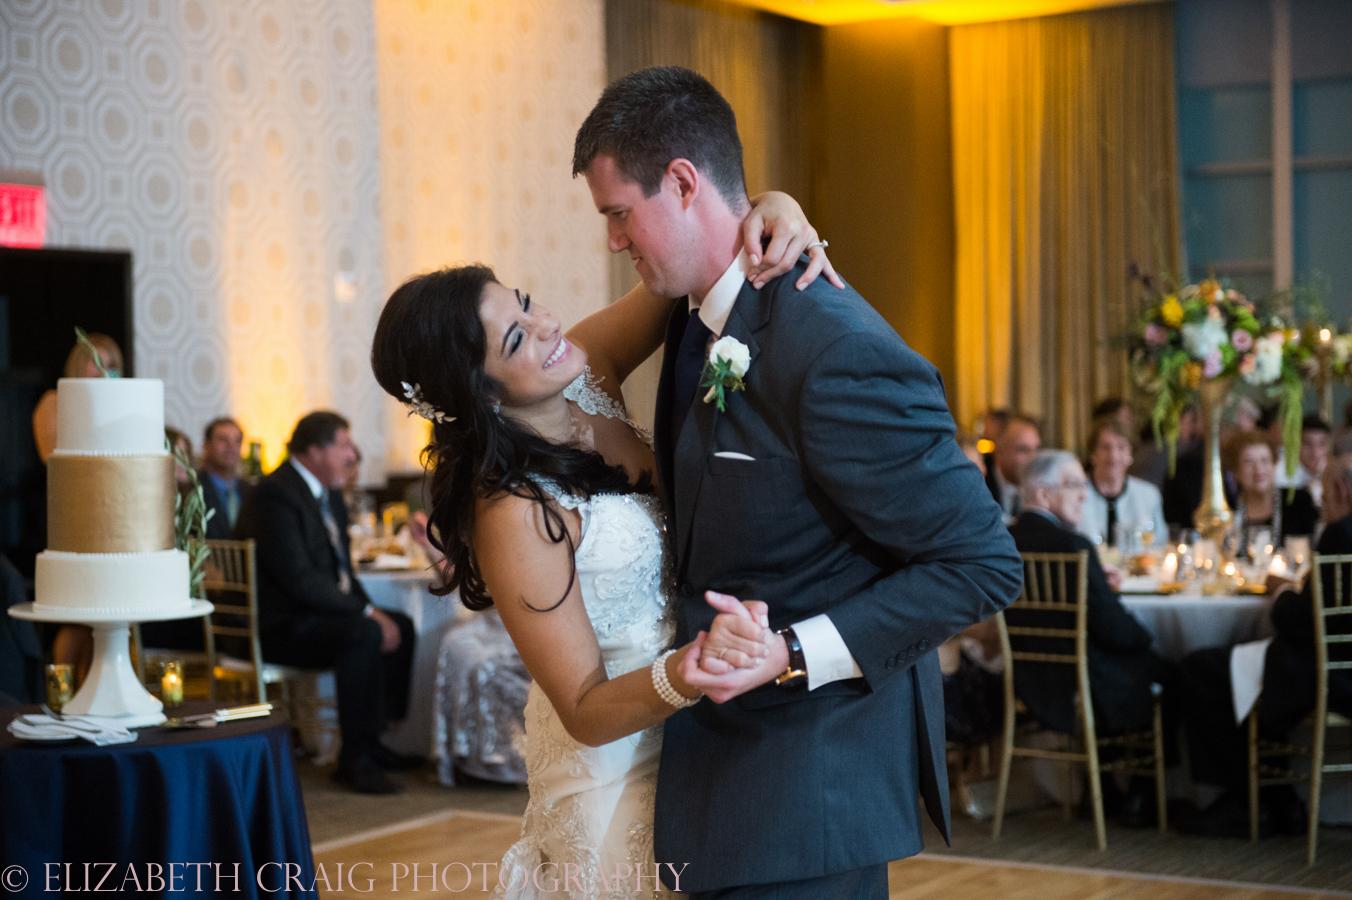 pittsburgh-greek-weddings-fairmont-weddings-receptions-elizabeth-craig-photohgraphy-020